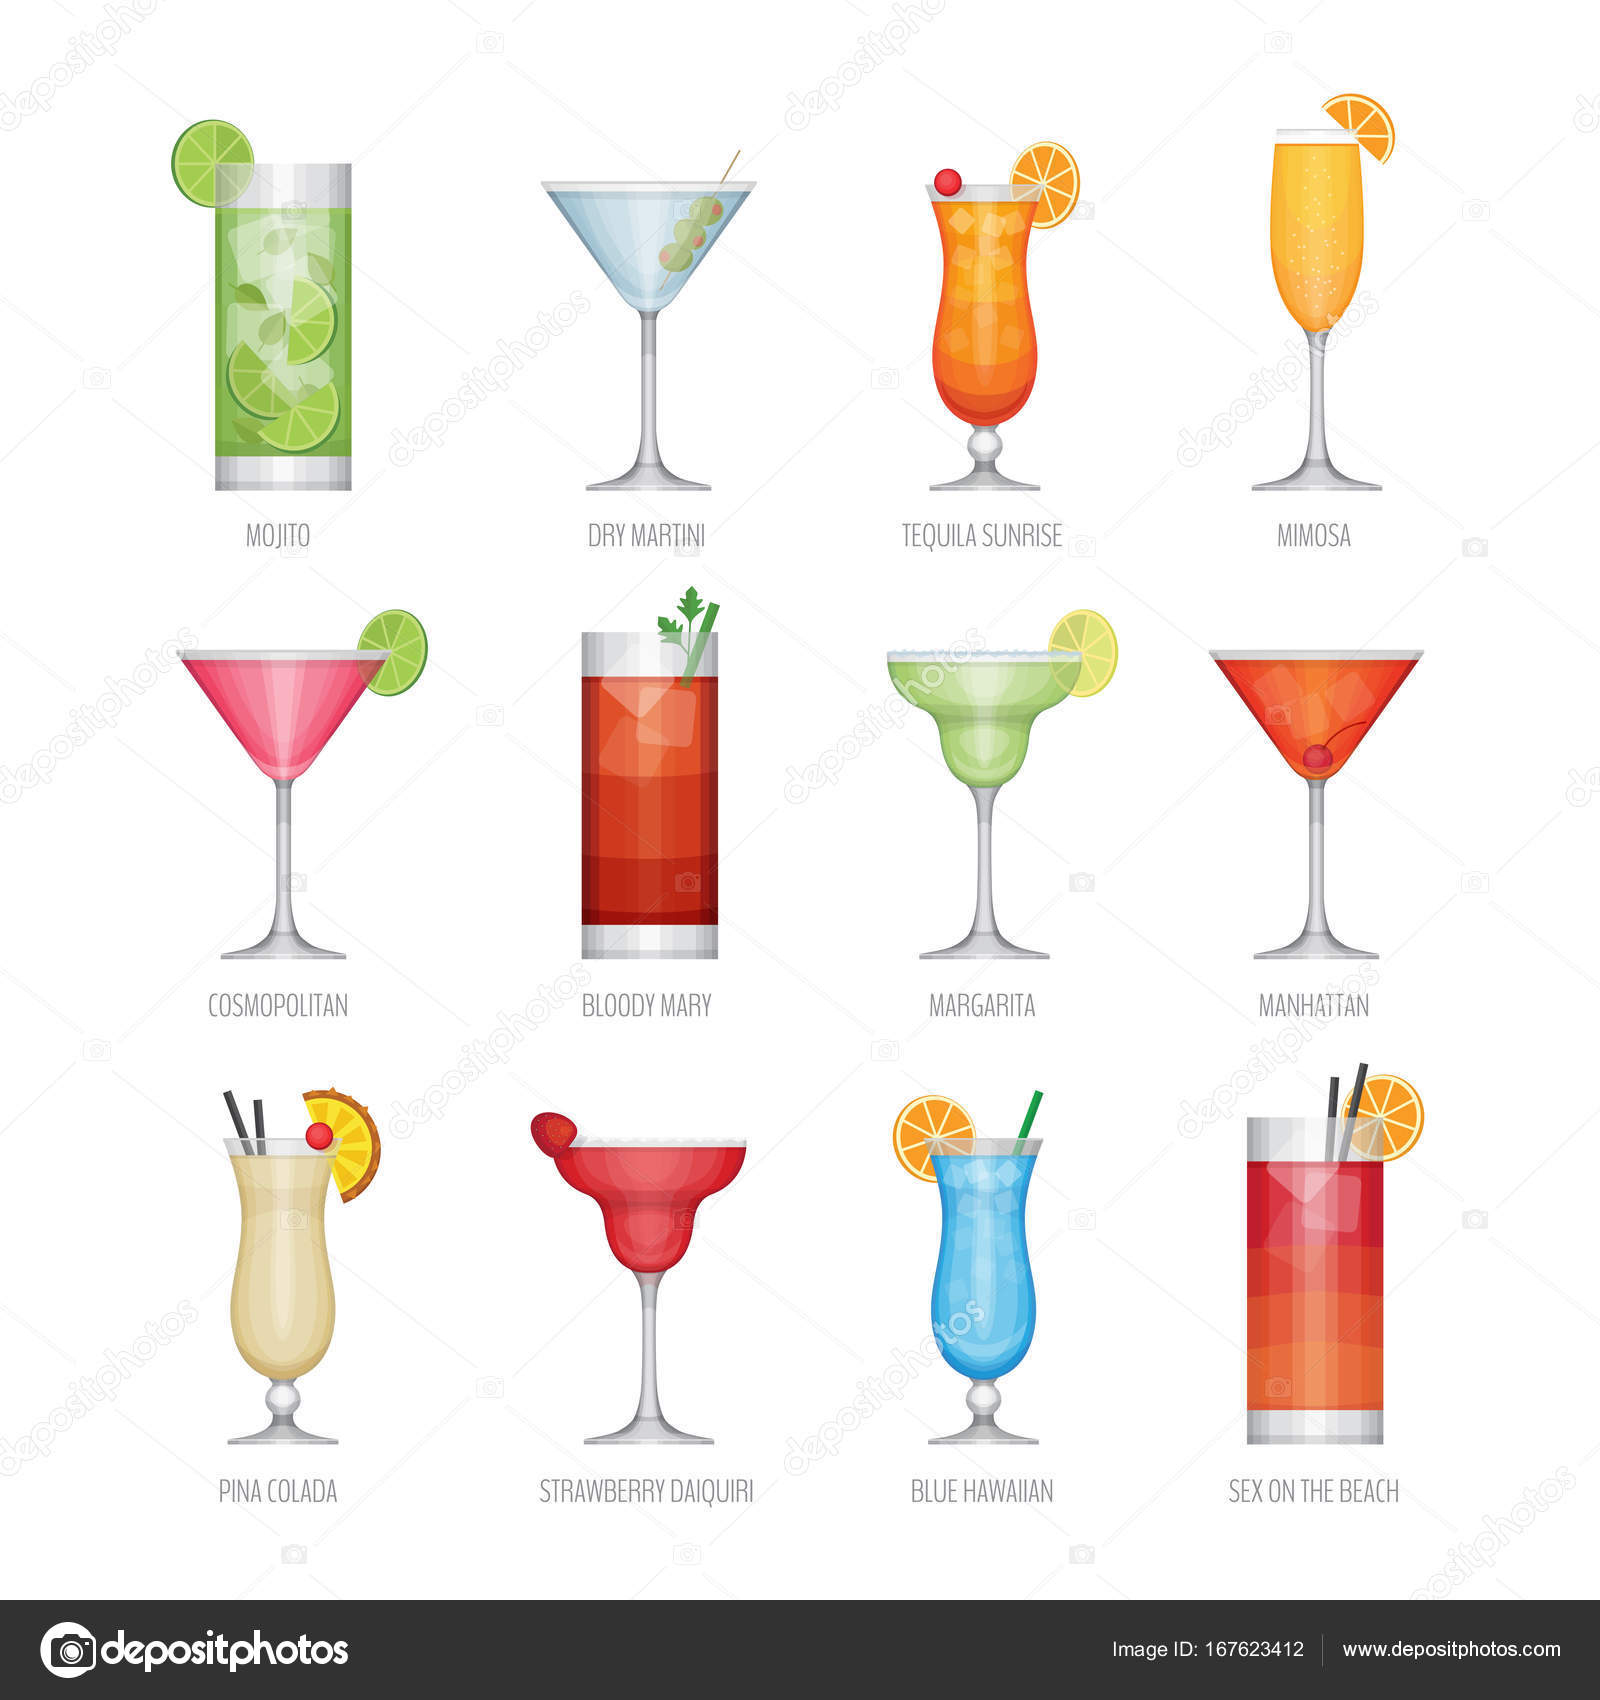 Inspiring Beliebte Cocktails The Best Of Flache Icons Set Alkohol Cocktail. Flache Design-stil,